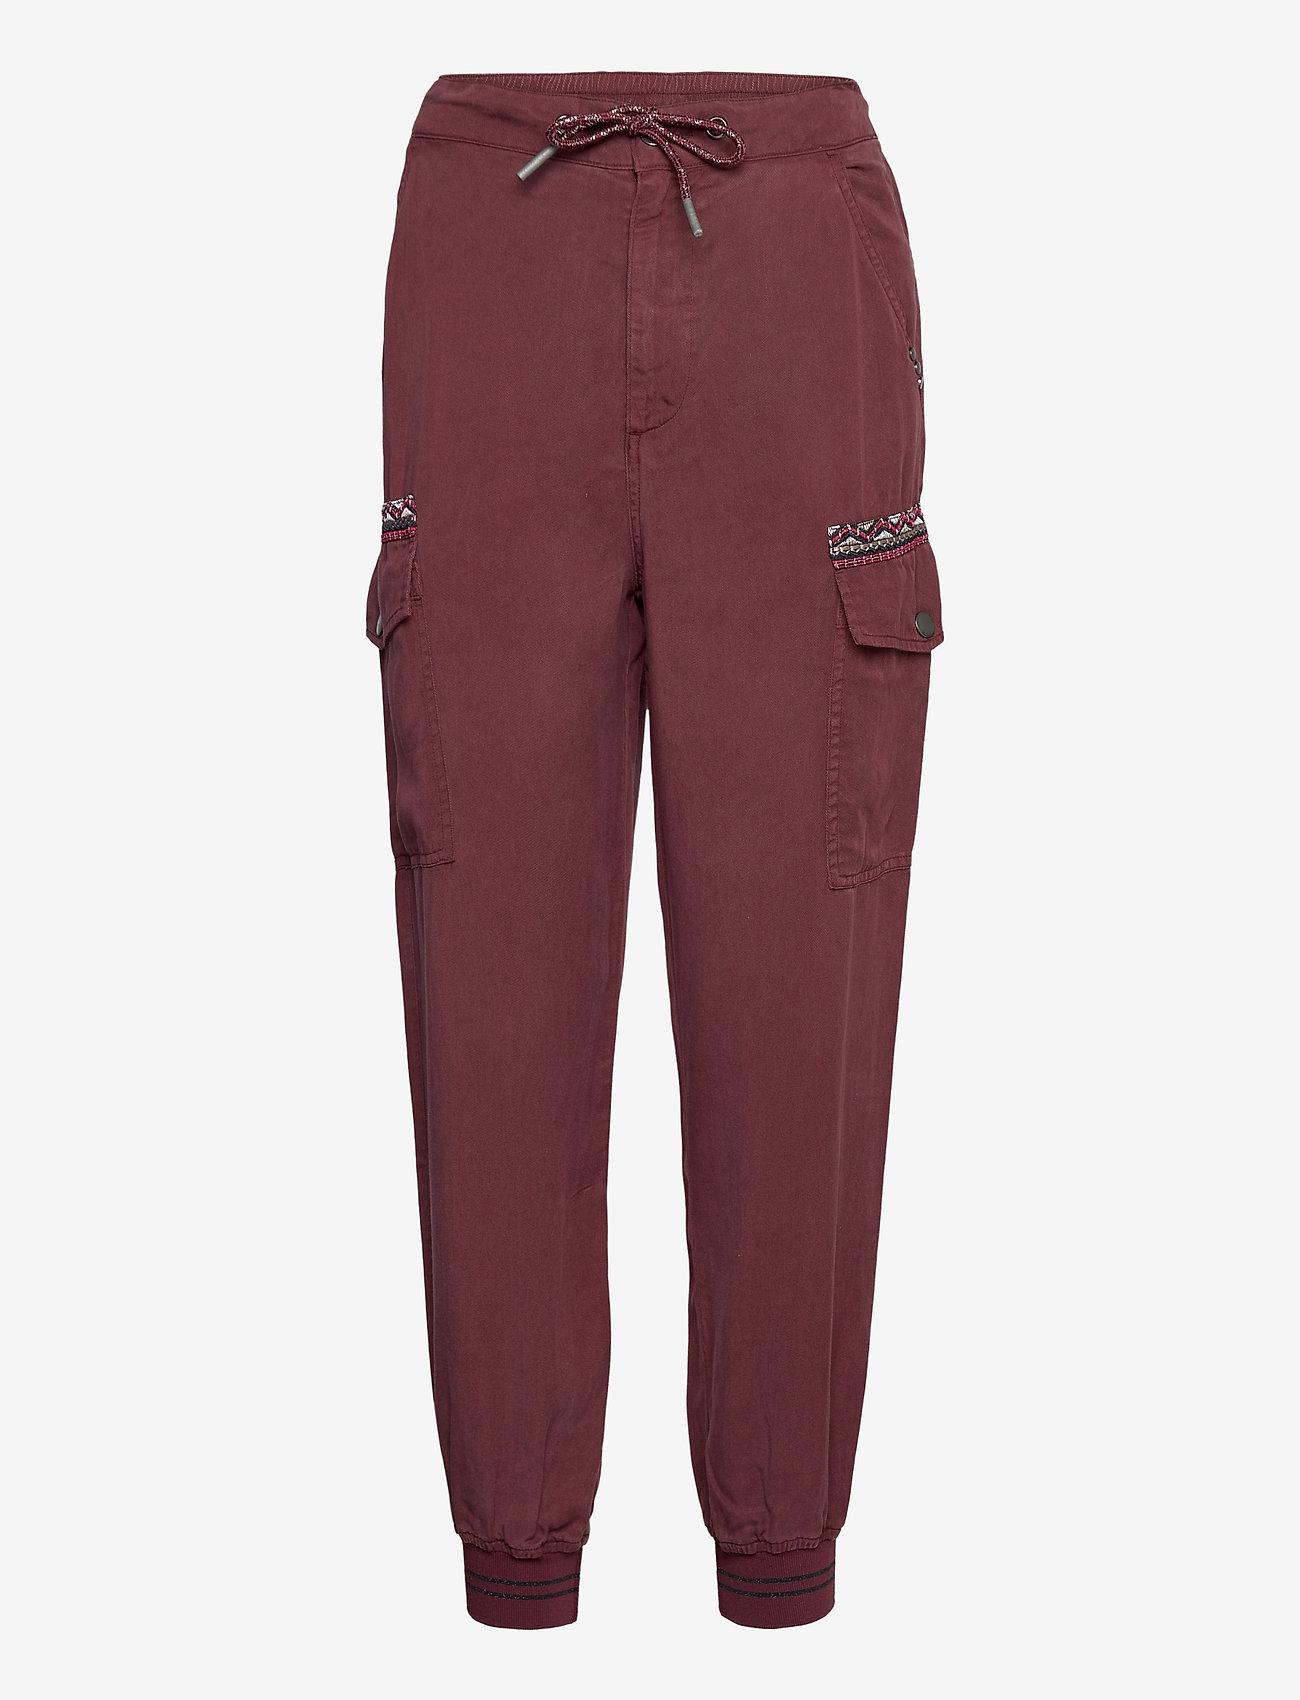 Desigual - PANT GRETA - kläder - borgoÑa - 0